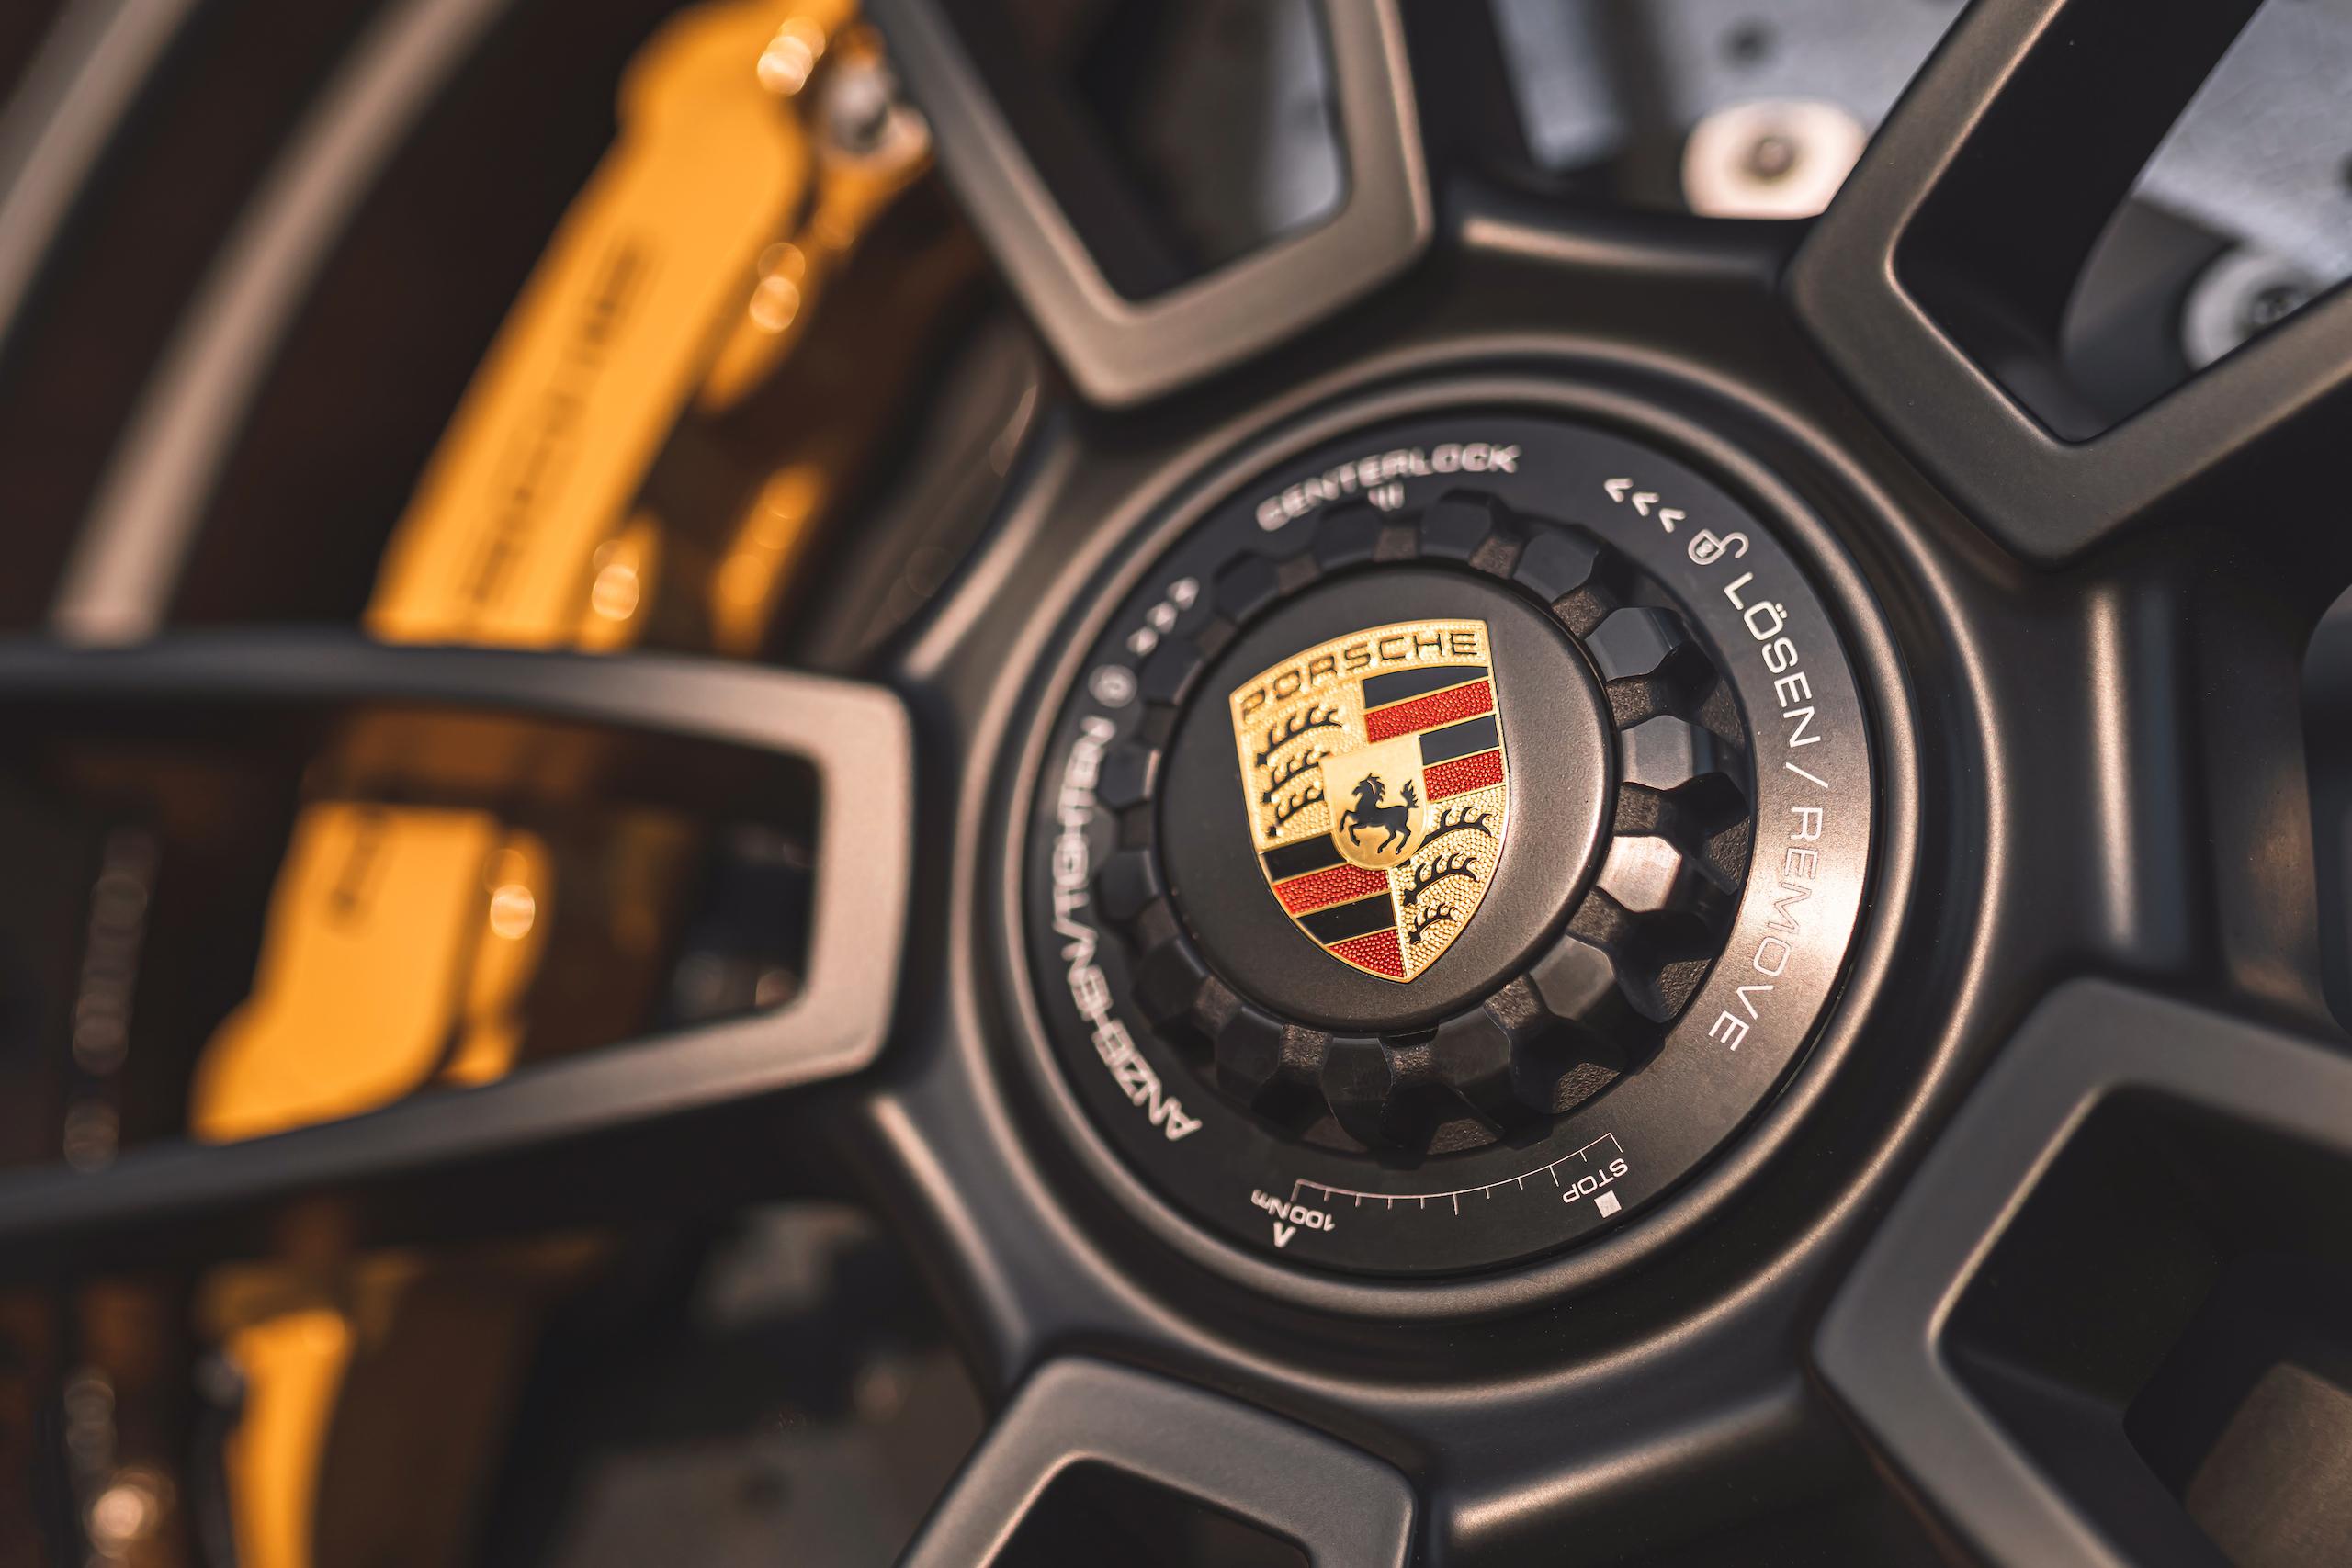 Porsche 911 GTS wheel hub detail